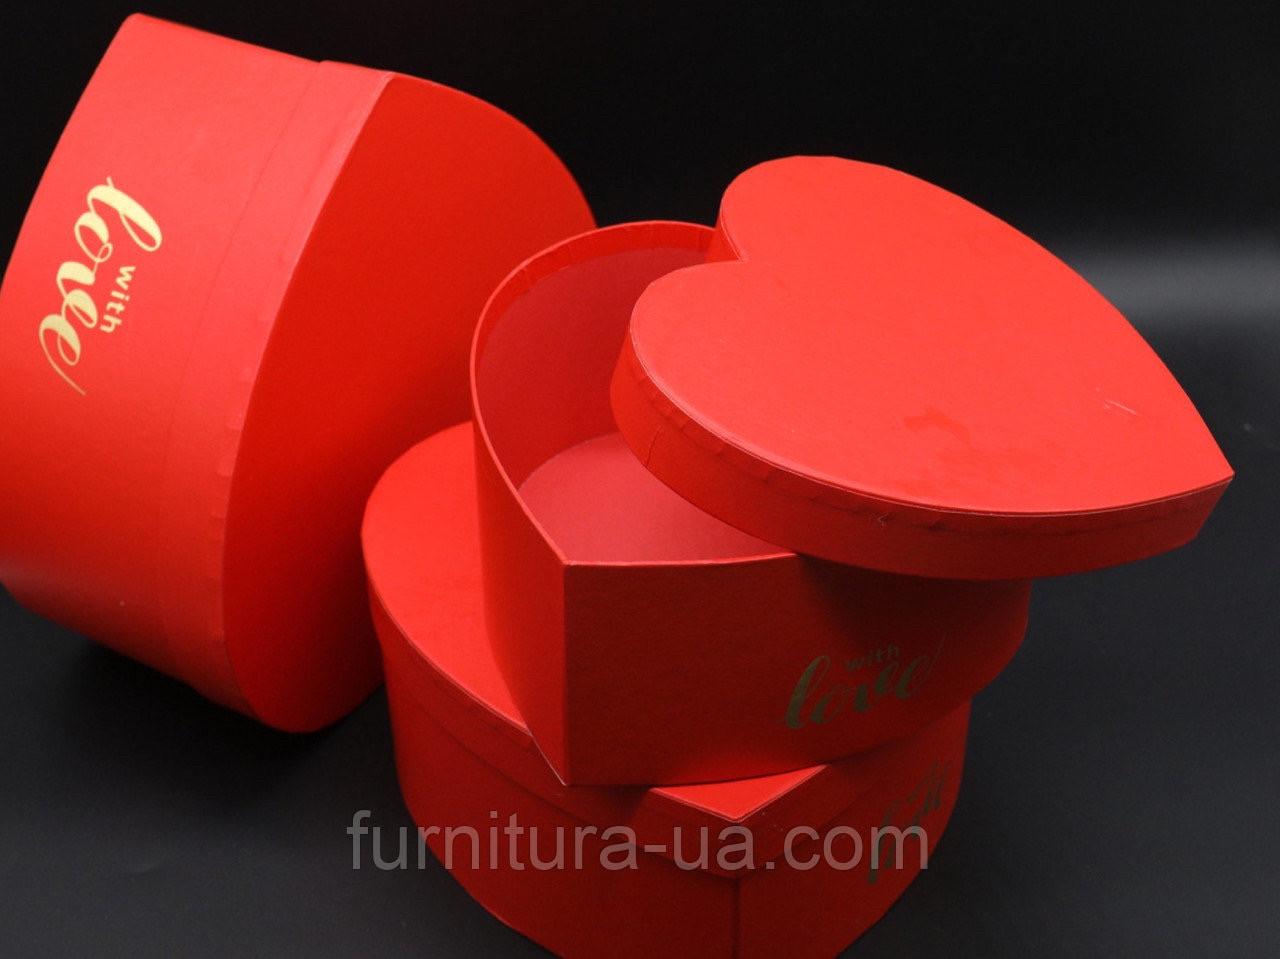 Коробка подарочная сердце. Три шт/комплект. Цвет красный. 25х25х12см